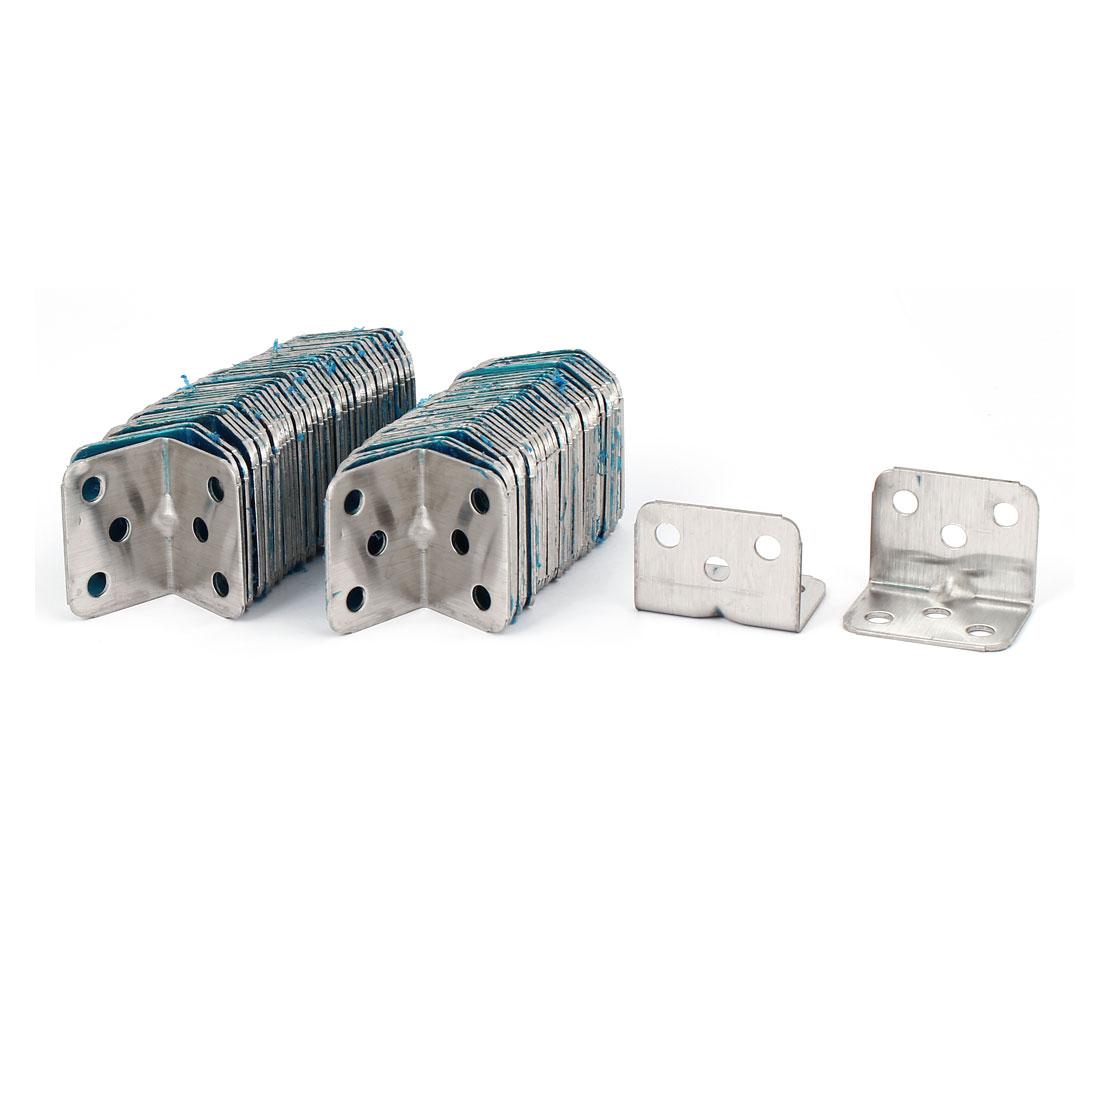 28mm x 28mm x 1.3mm Stainless Steel 90-Degree Corner Brace Angle Bracket 80PCS